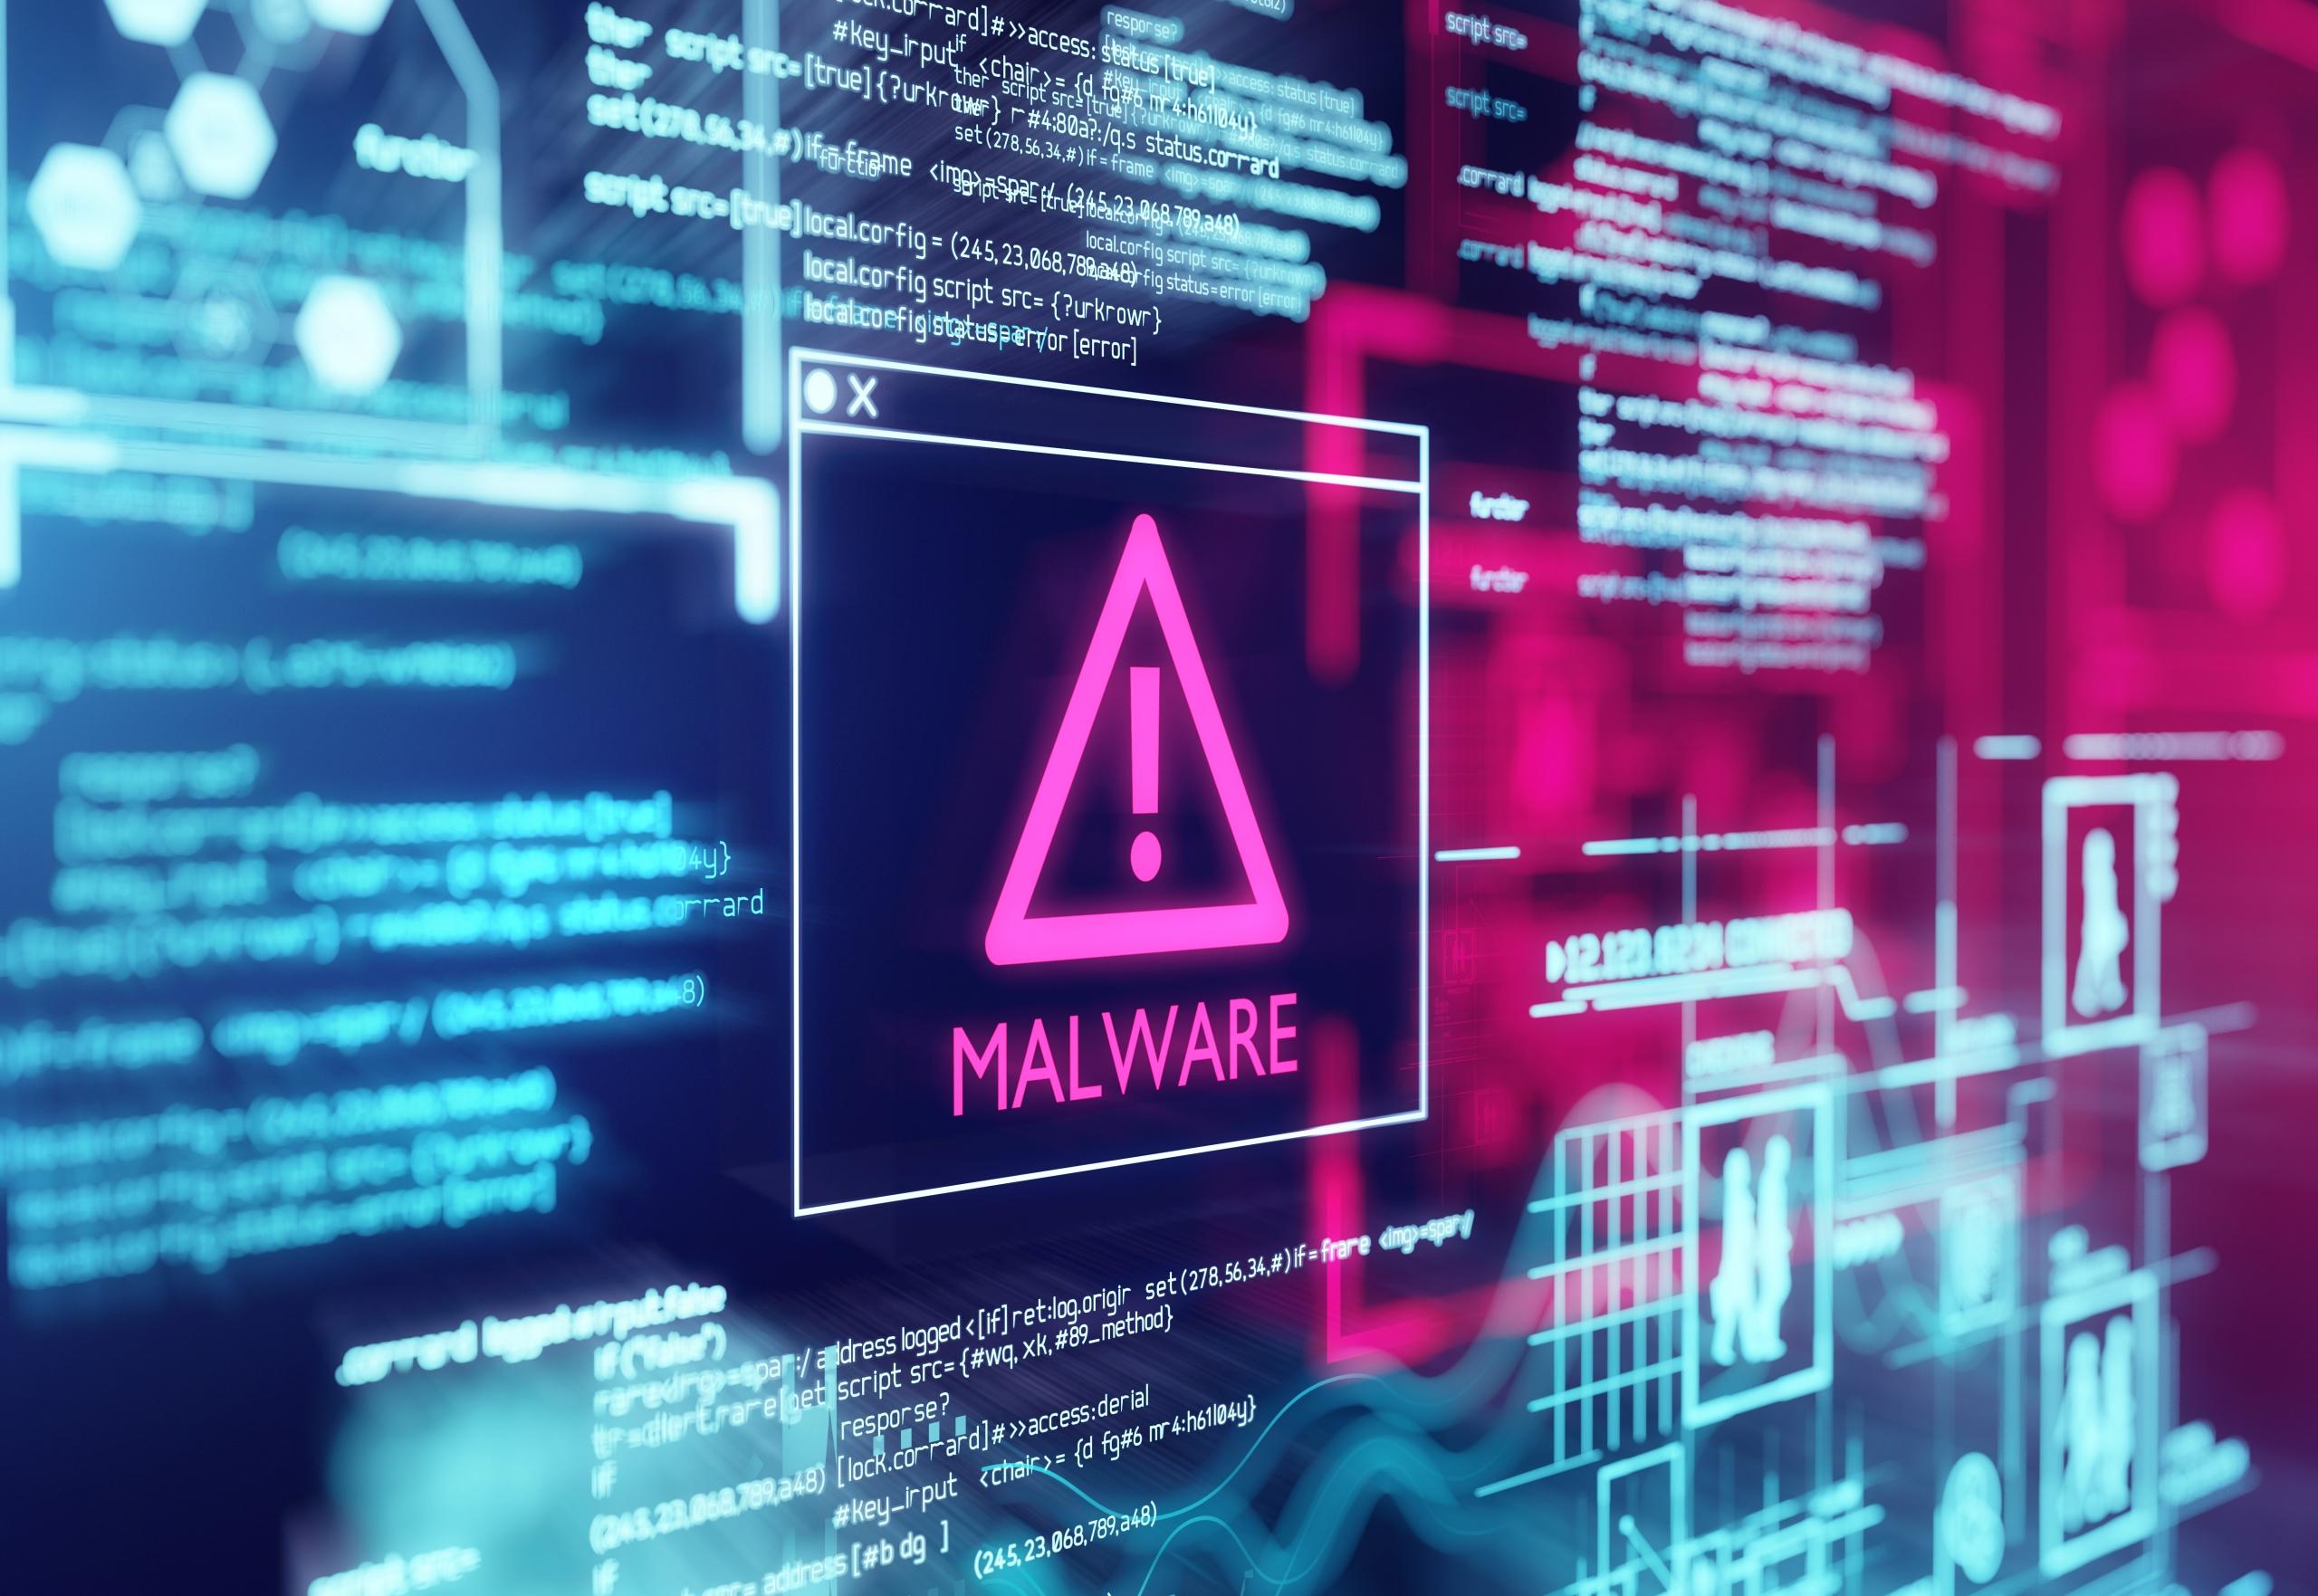 types of malware